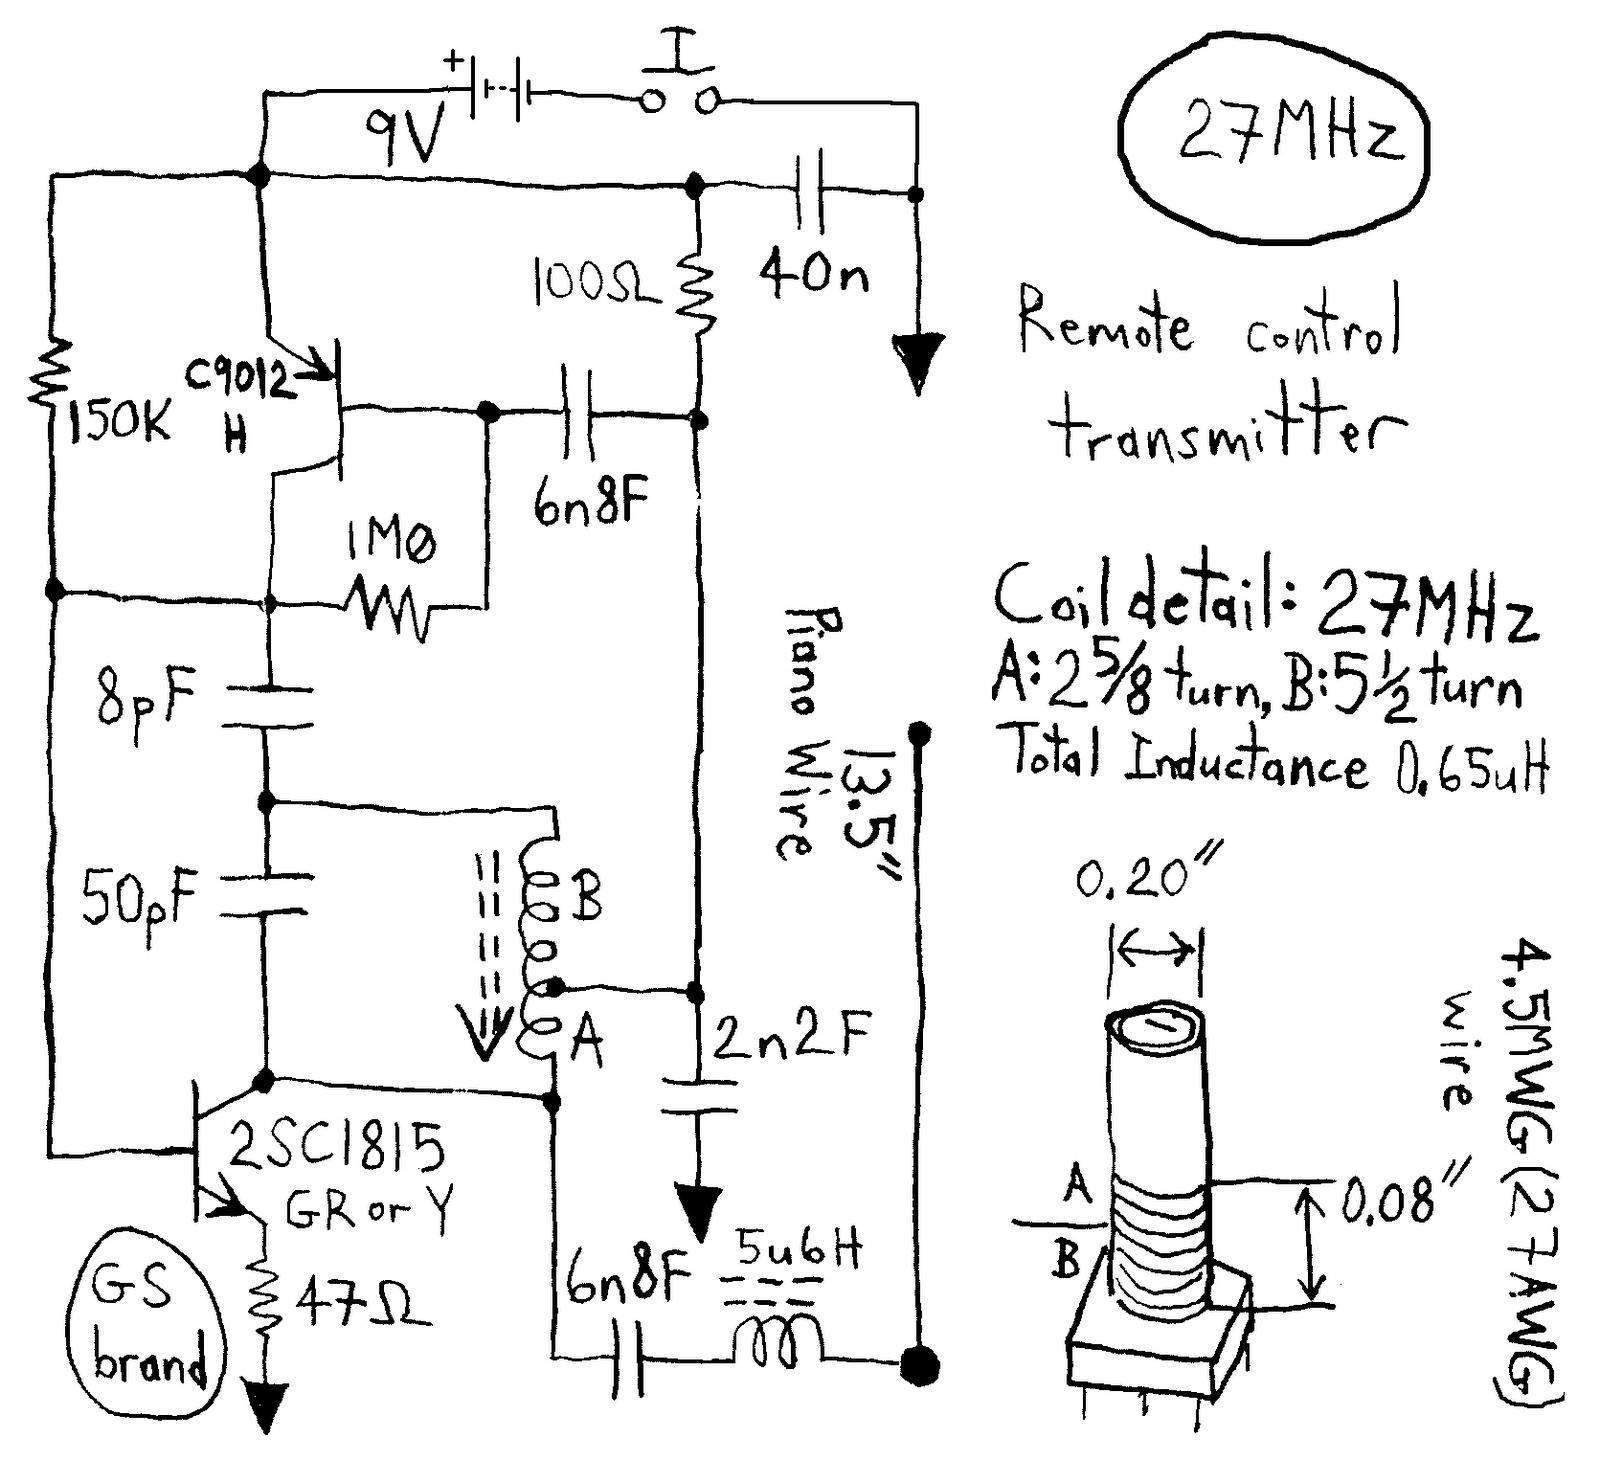 eletr u00d4nica do papai noel  circuitos de 27  40 e 49 mhz